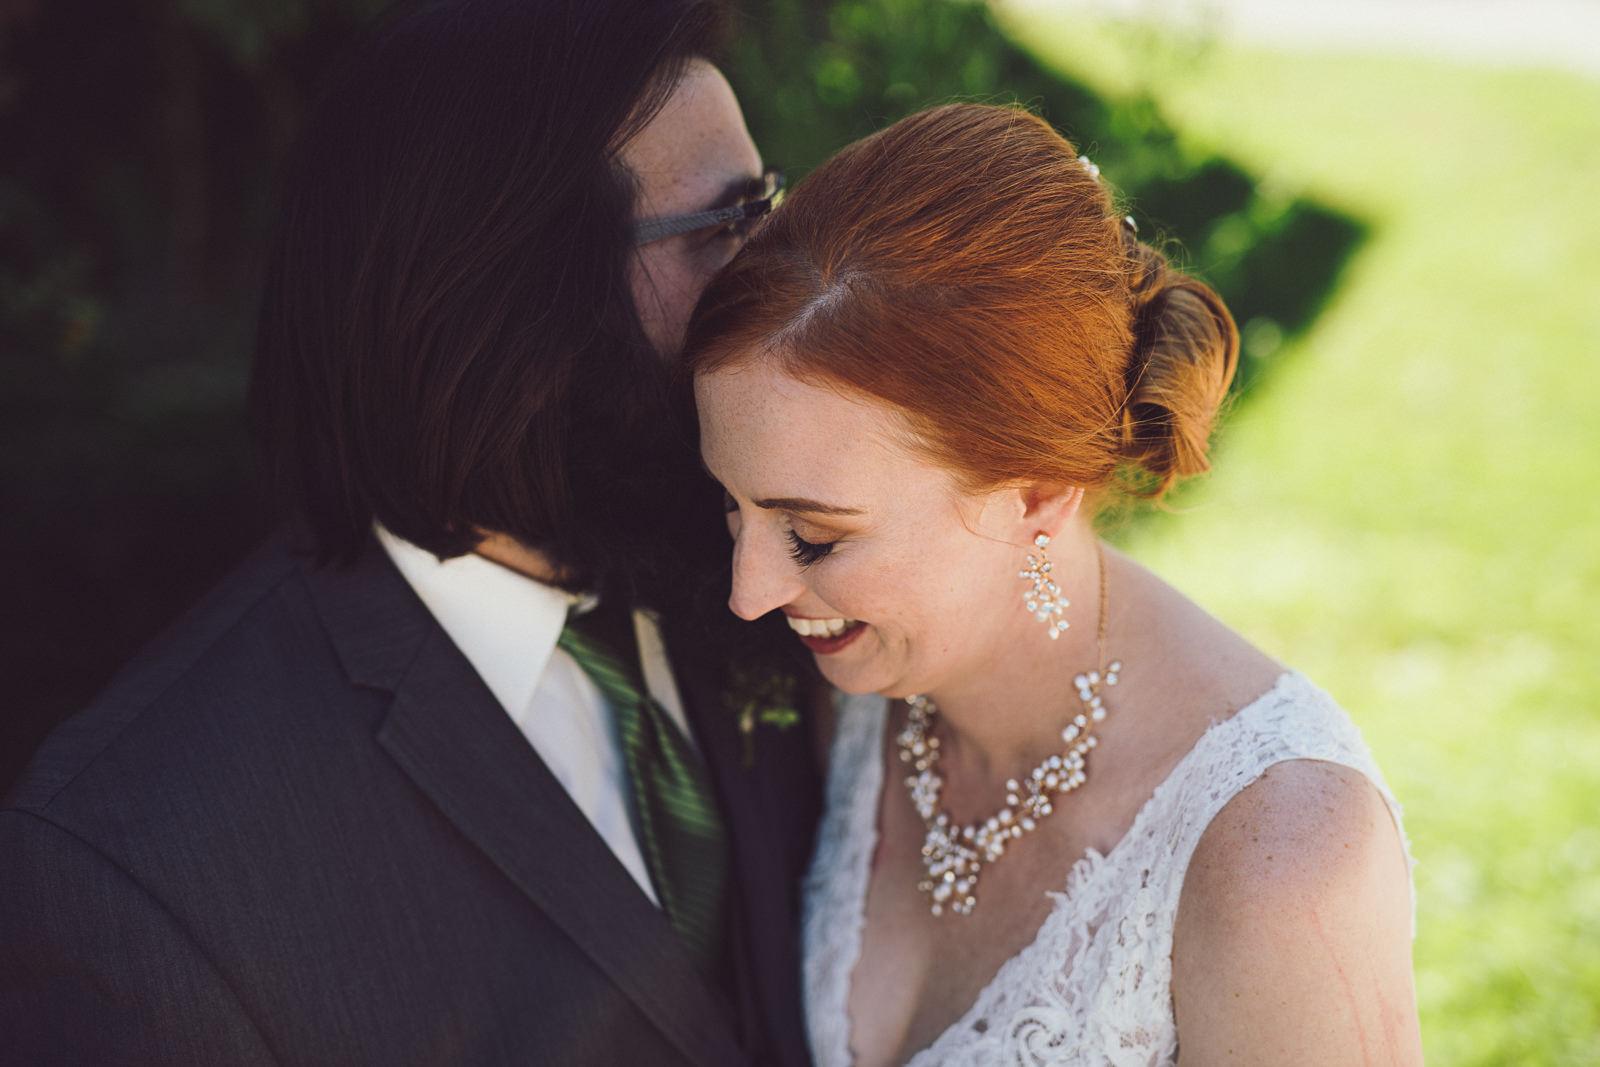 wedding-keely-caleb-422-name-your-photo.jpg